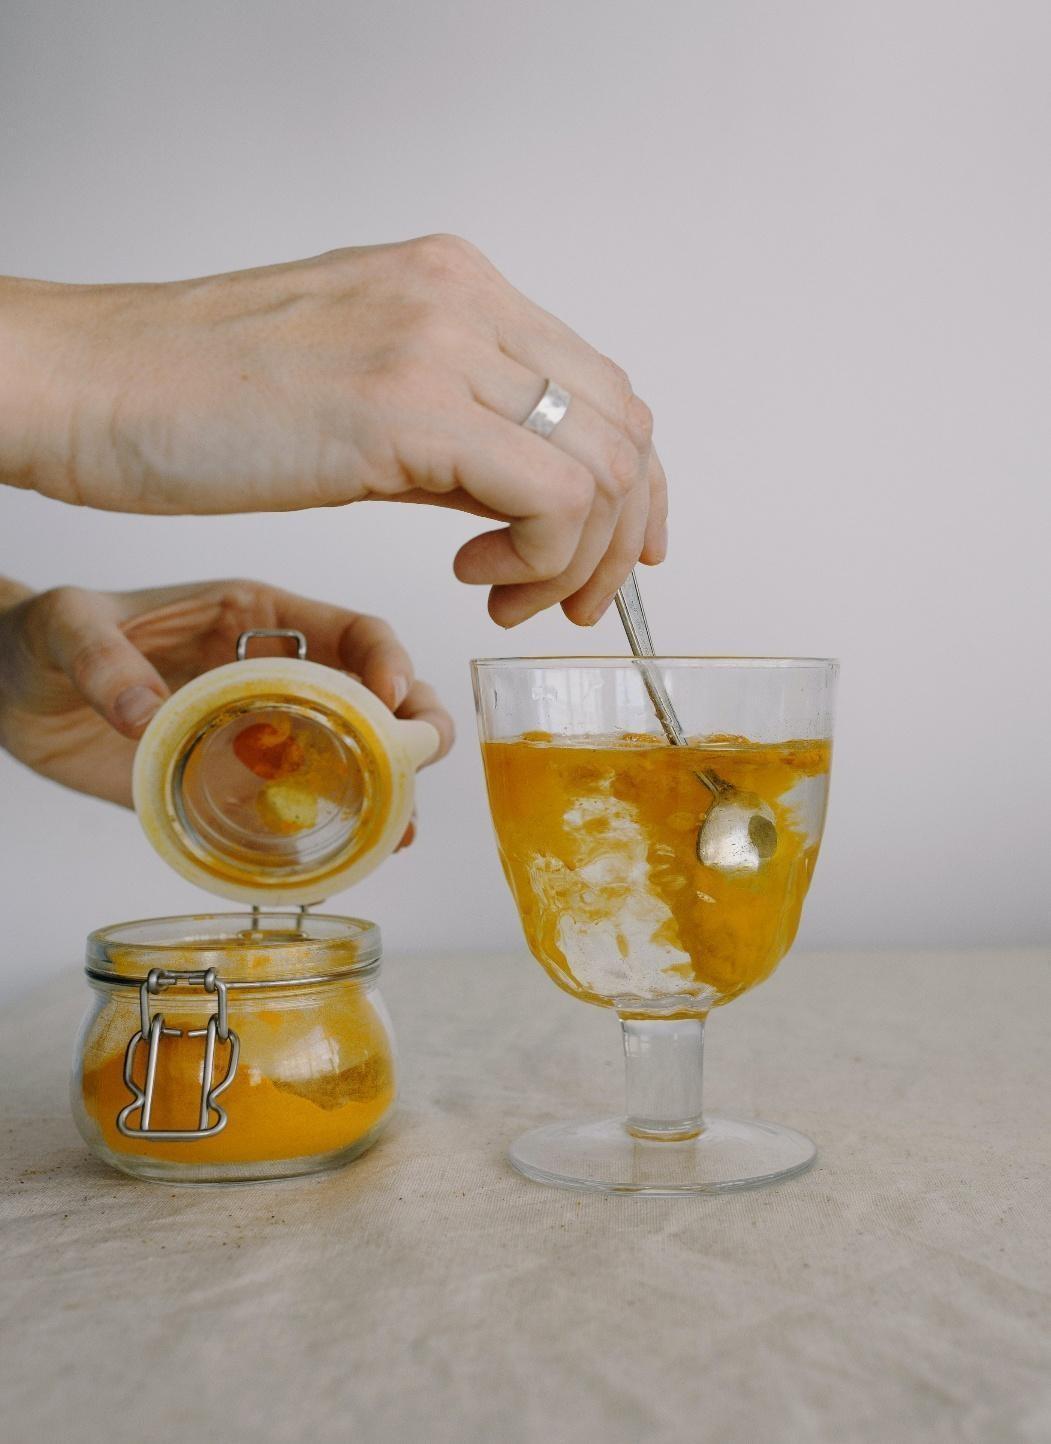 a cup of turmeric tea-a turmeric as added to water to make a turmeric tea